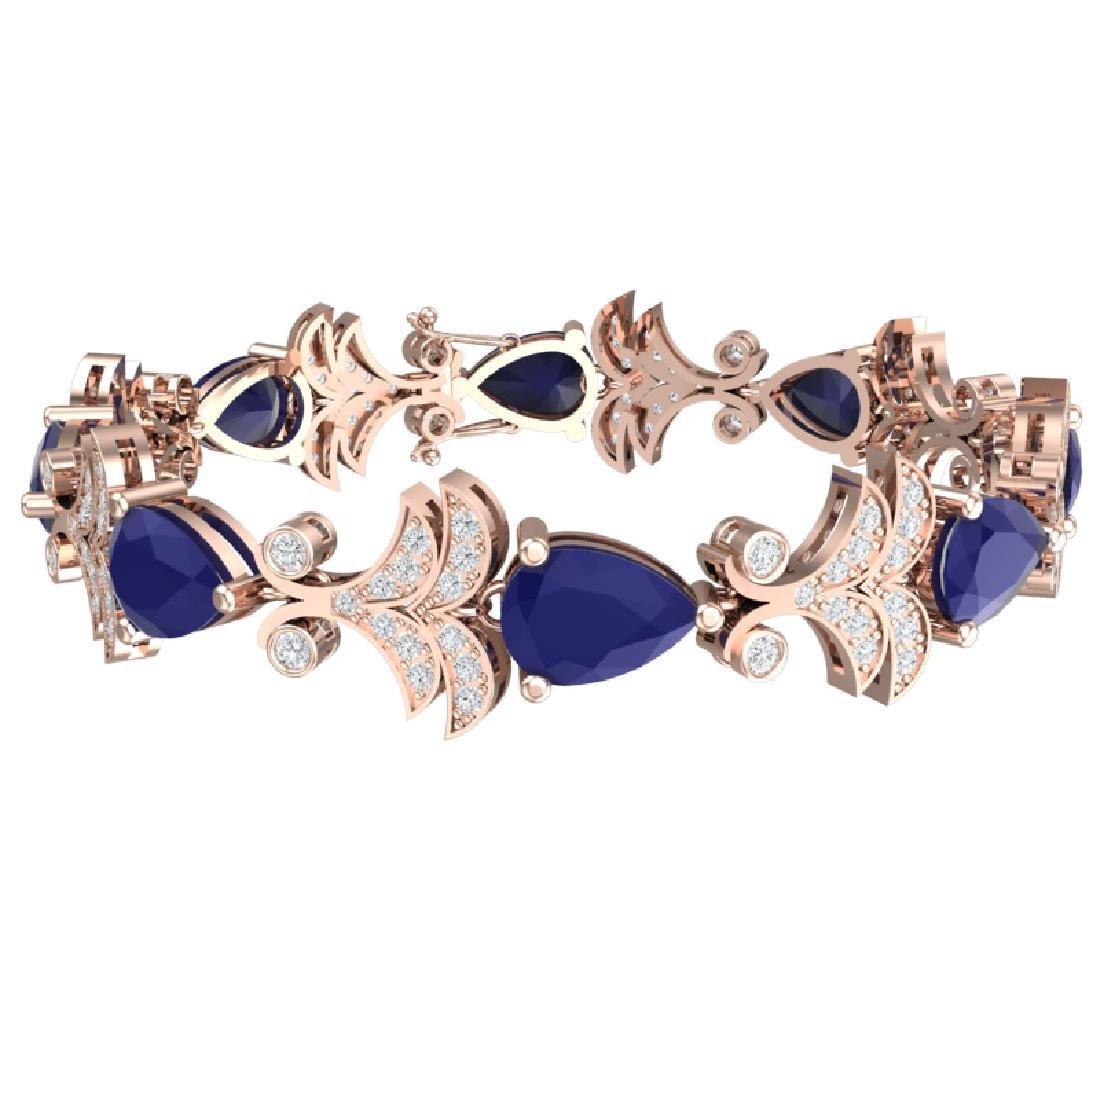 24.8 CTW Royalty Sapphire & VS Diamond Bracelet 18K - 3